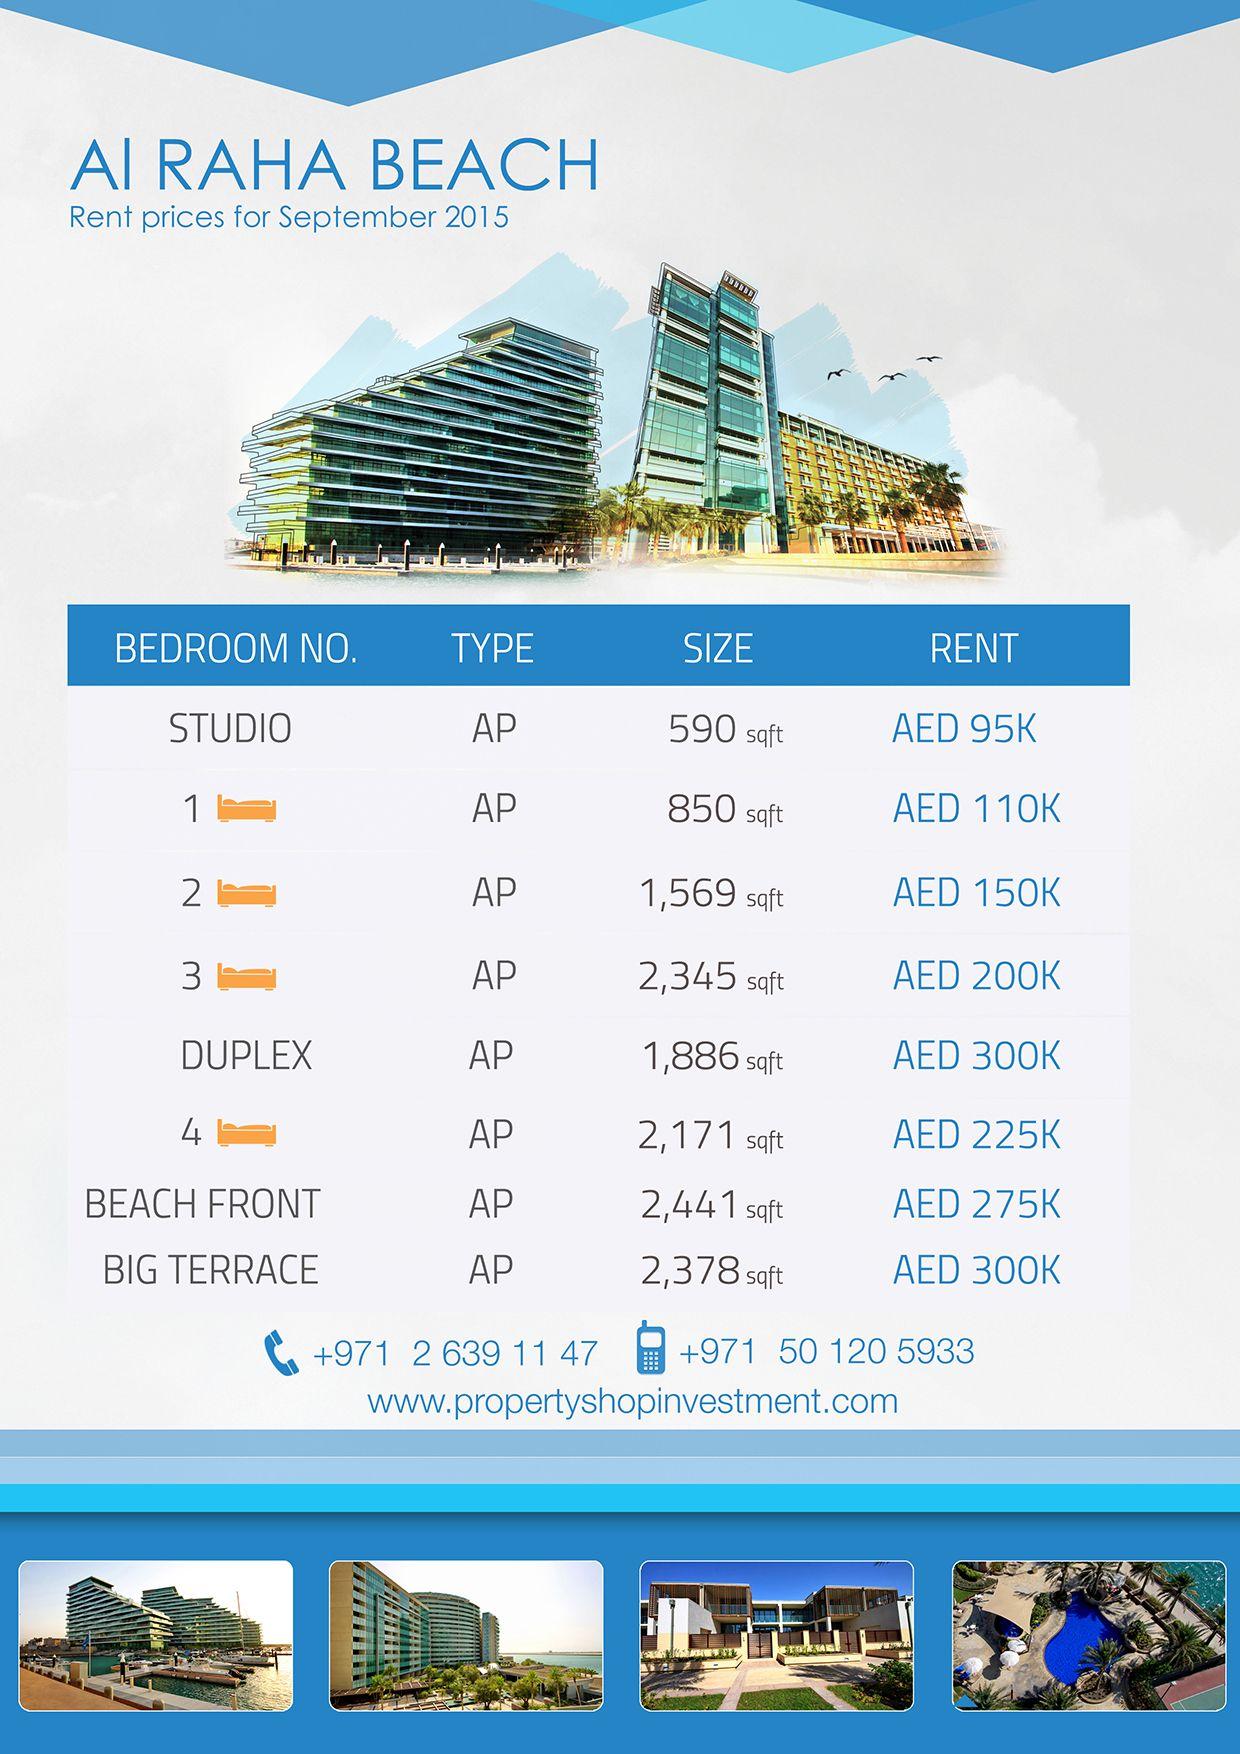 #AlRahaBeach Properties for Rent #inAbuDhabi